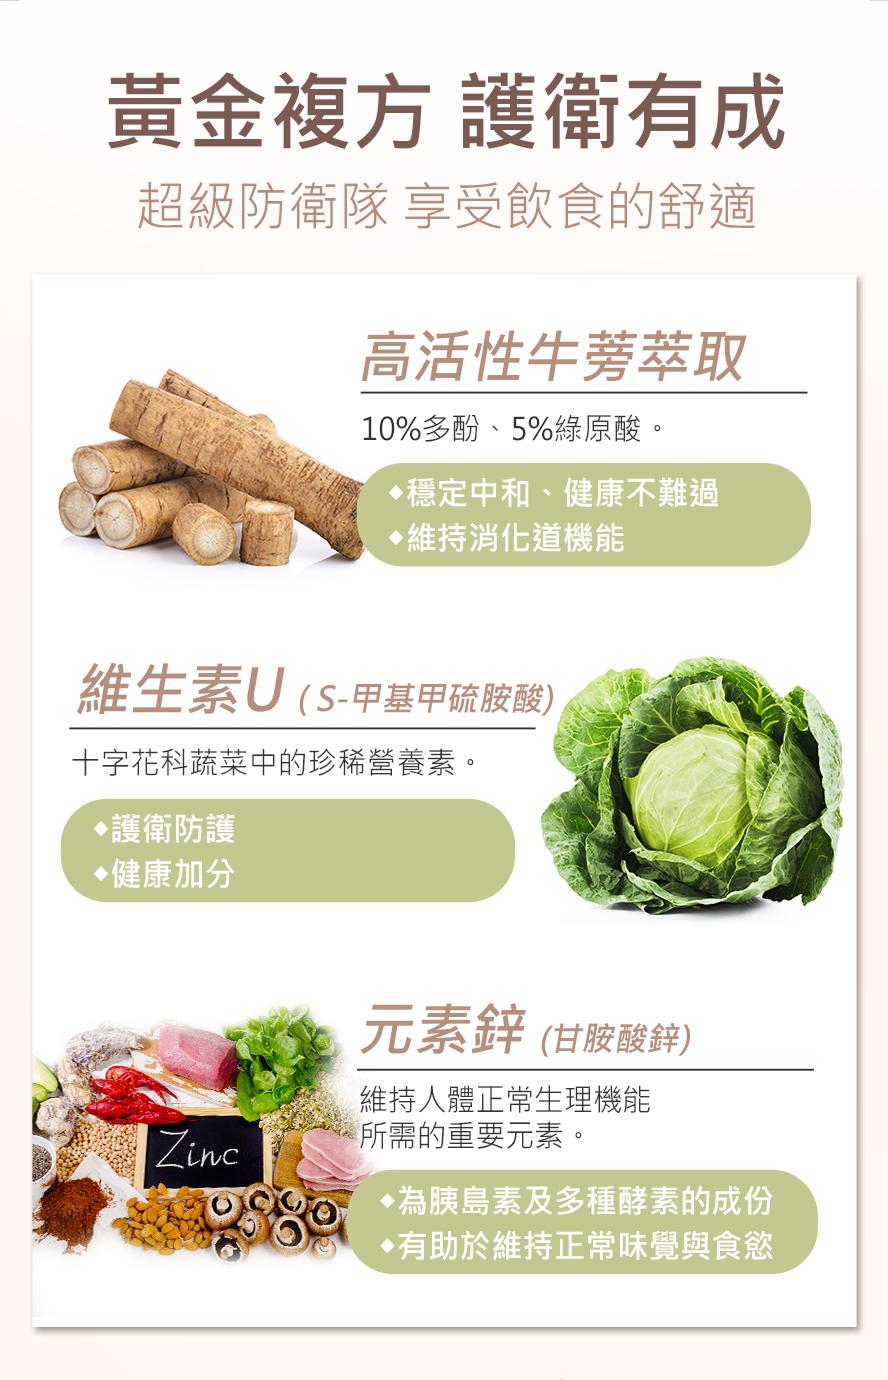 BHK's牛蒡為帶皮牛蒡,多酚大於10% 綠原酸大於5%,添加維生素U跟鋅,舒緩胃痛不適感。